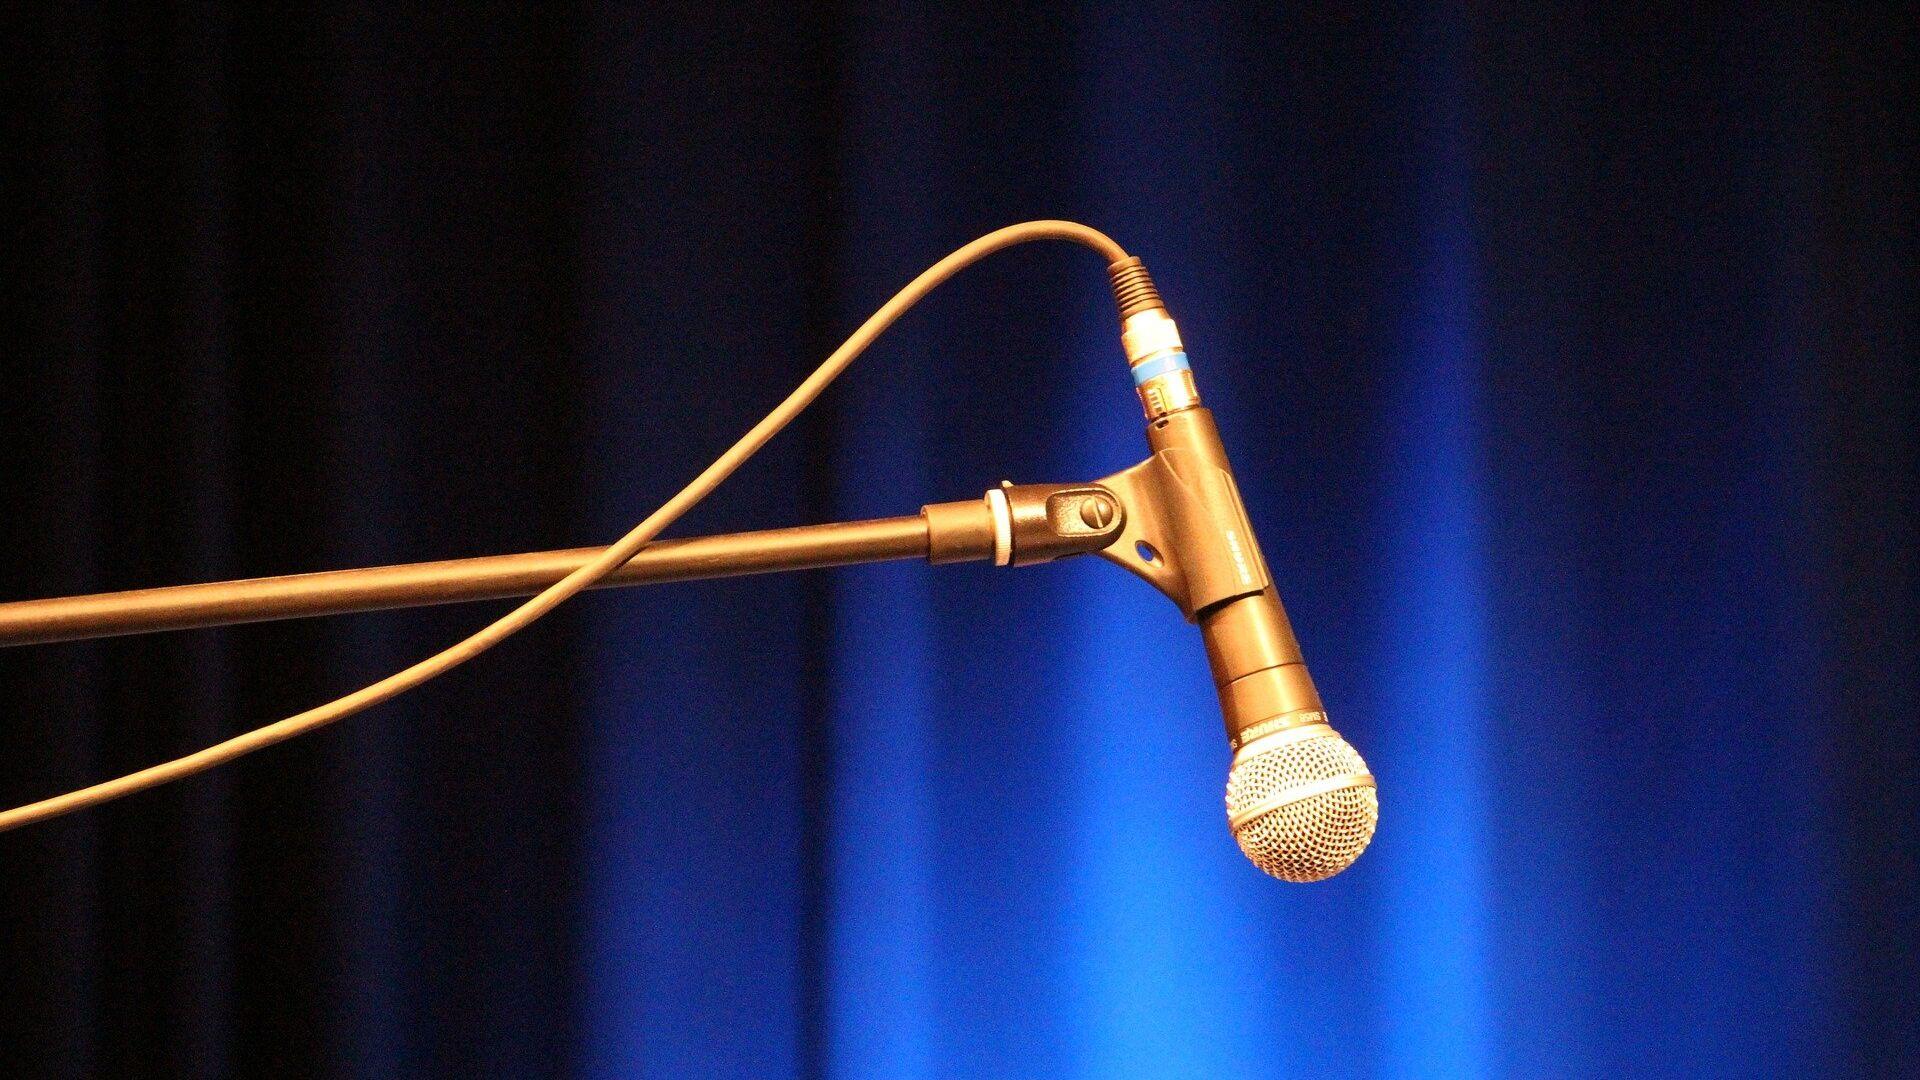 Un micrófono (imagen referencial) - Sputnik Mundo, 1920, 16.09.2021